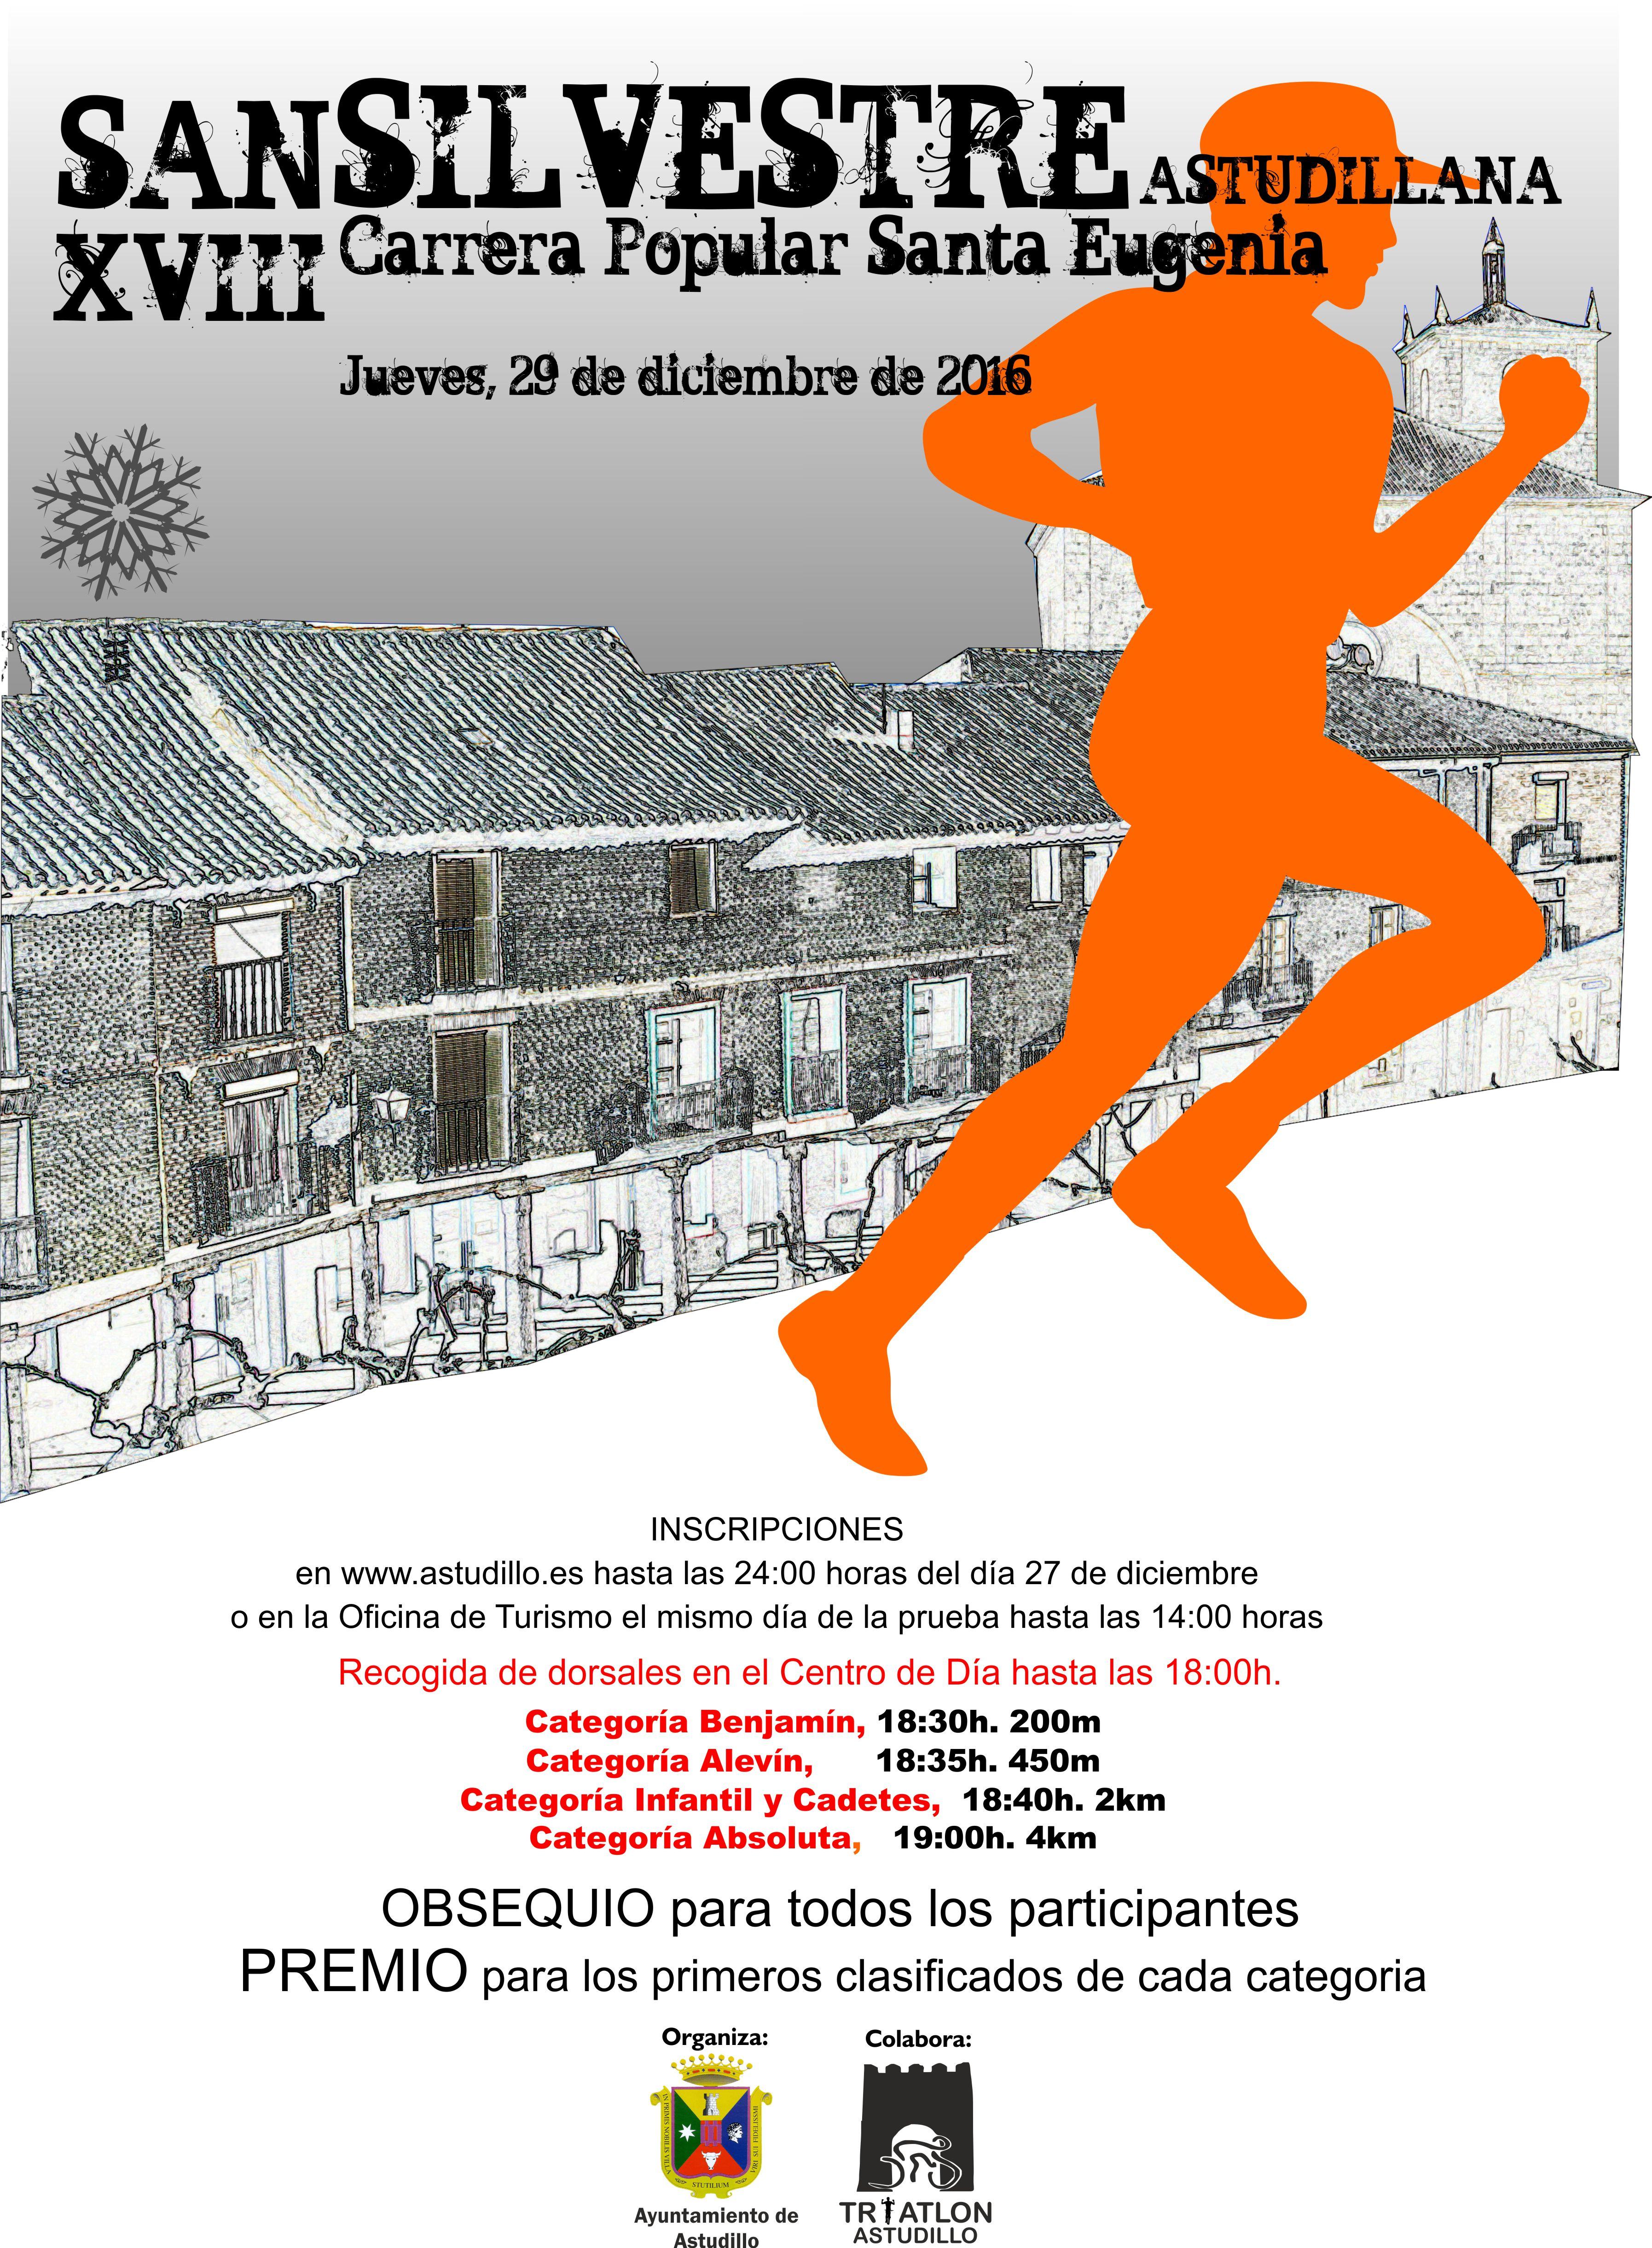 XVIII San Silvestre Astudillana, Carrera Popular Santa Eugenia